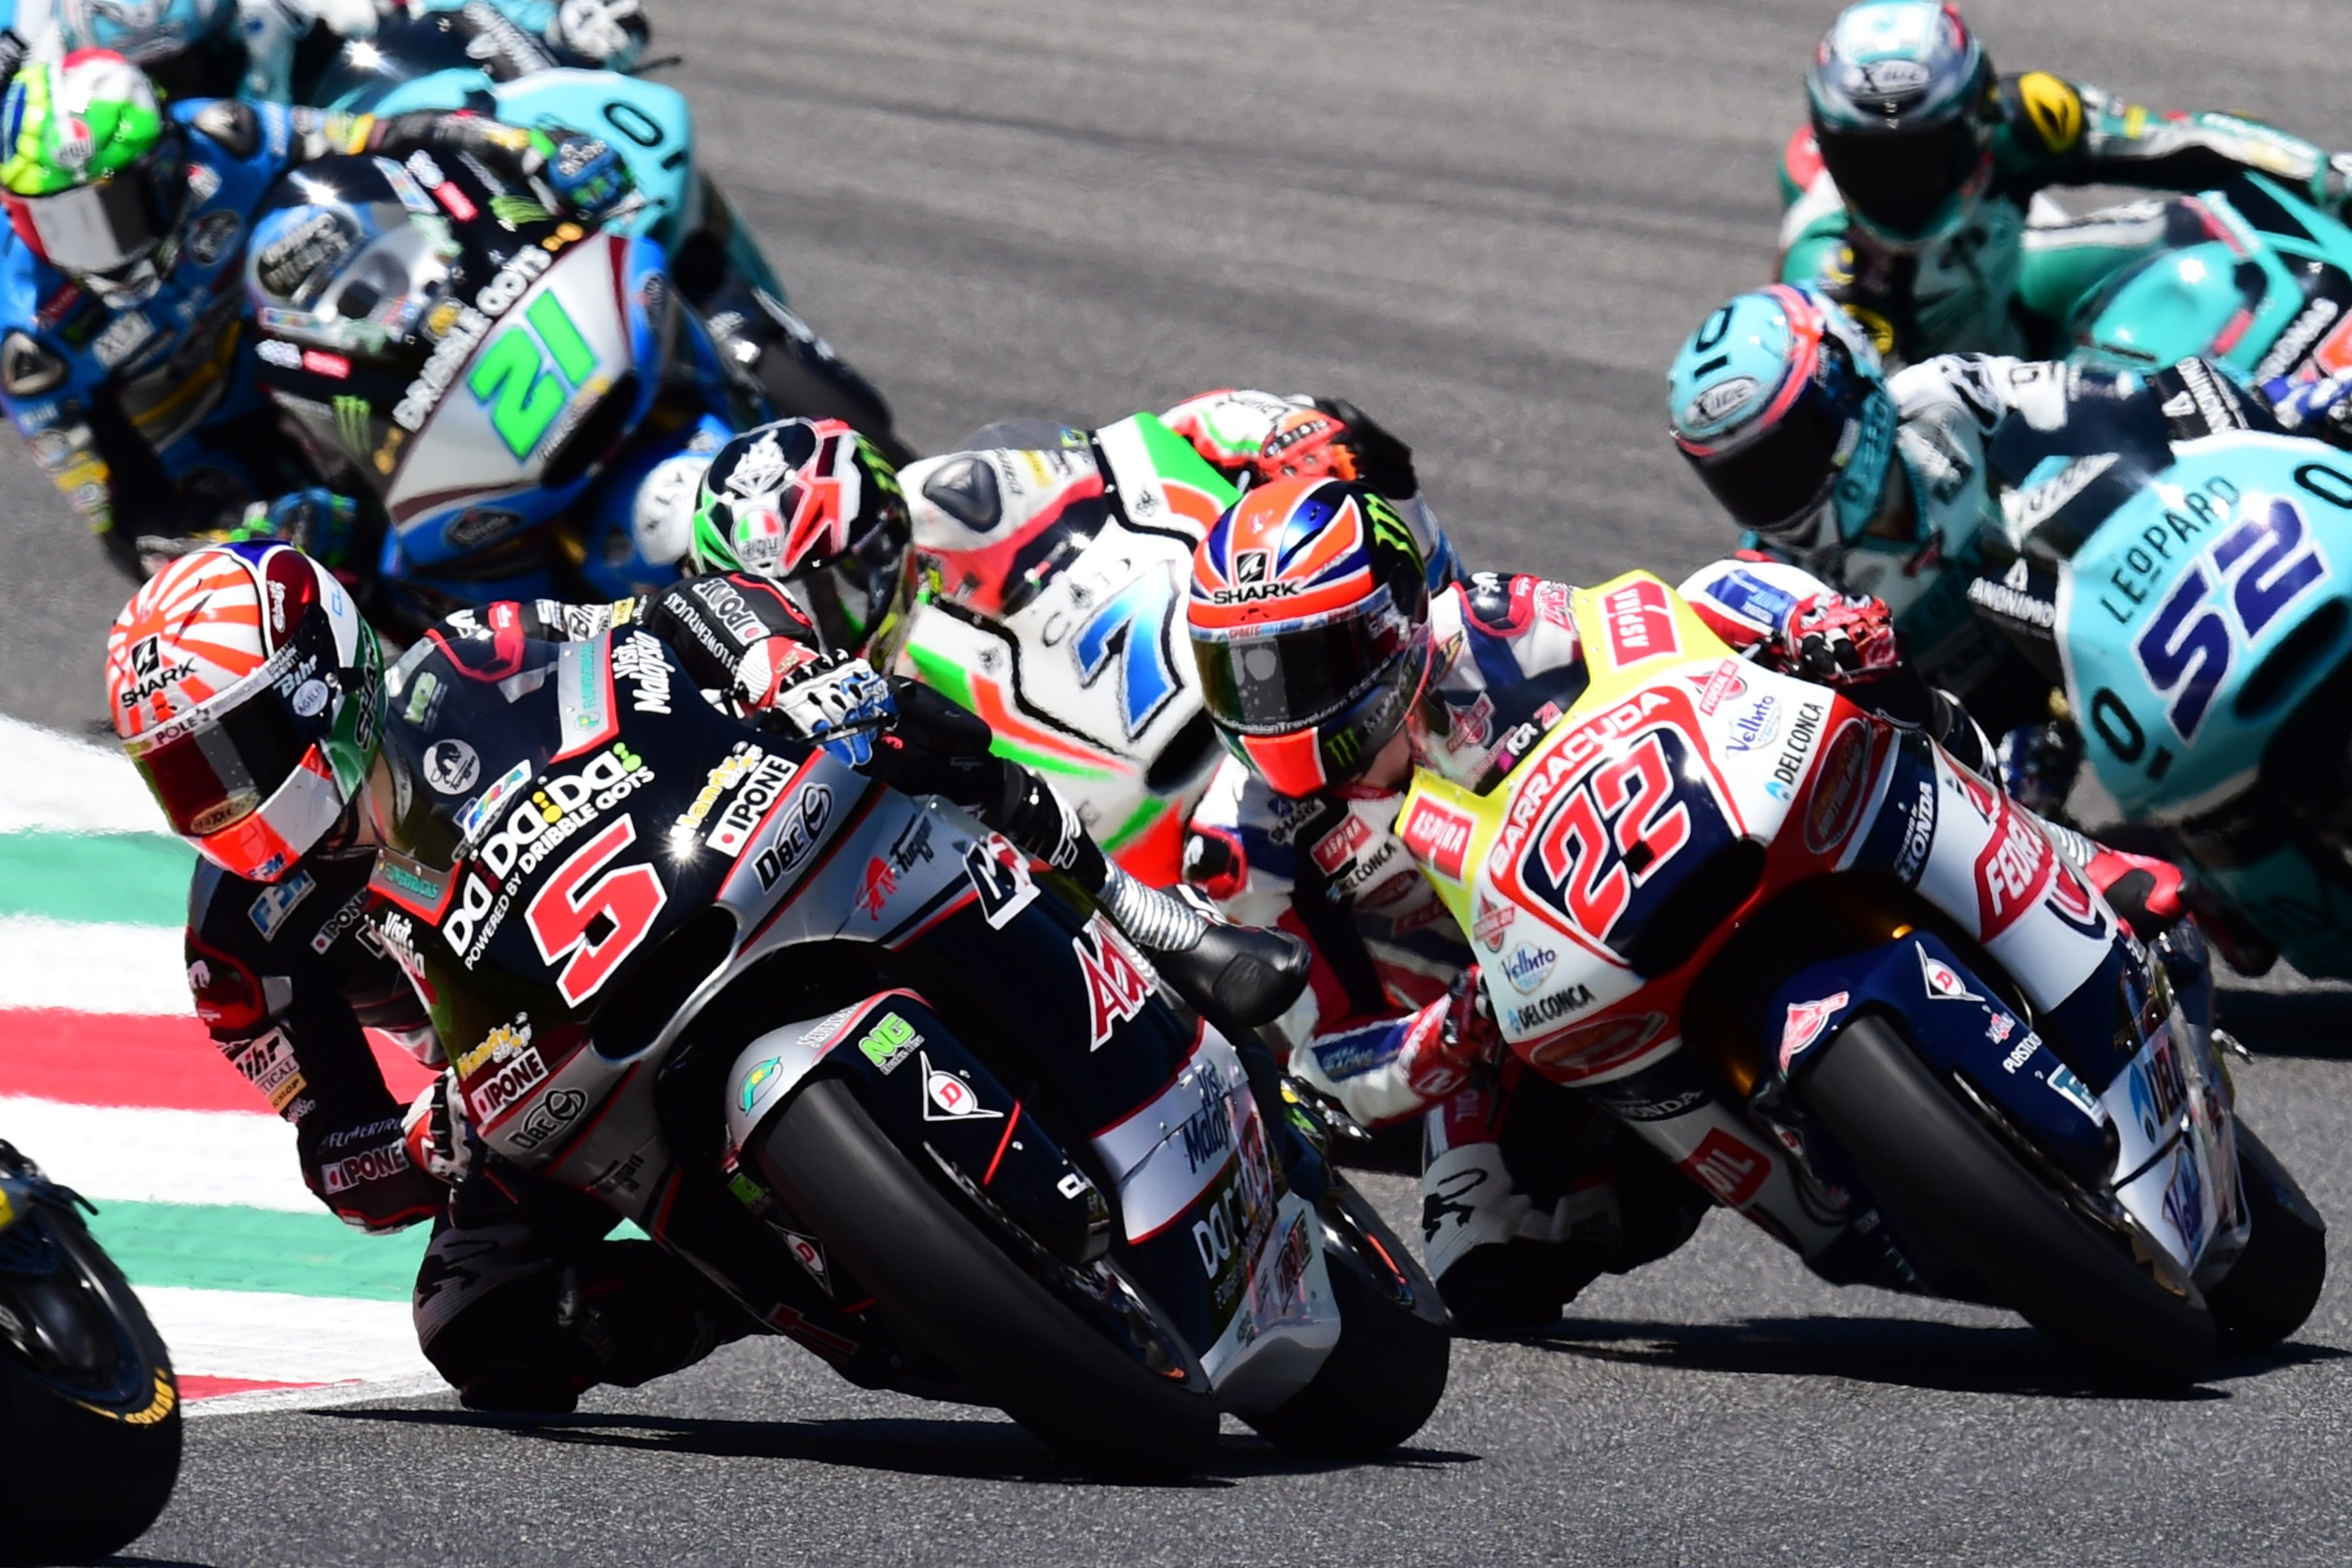 Moto - Lorenzo s'impose d'un souffle au Mugello